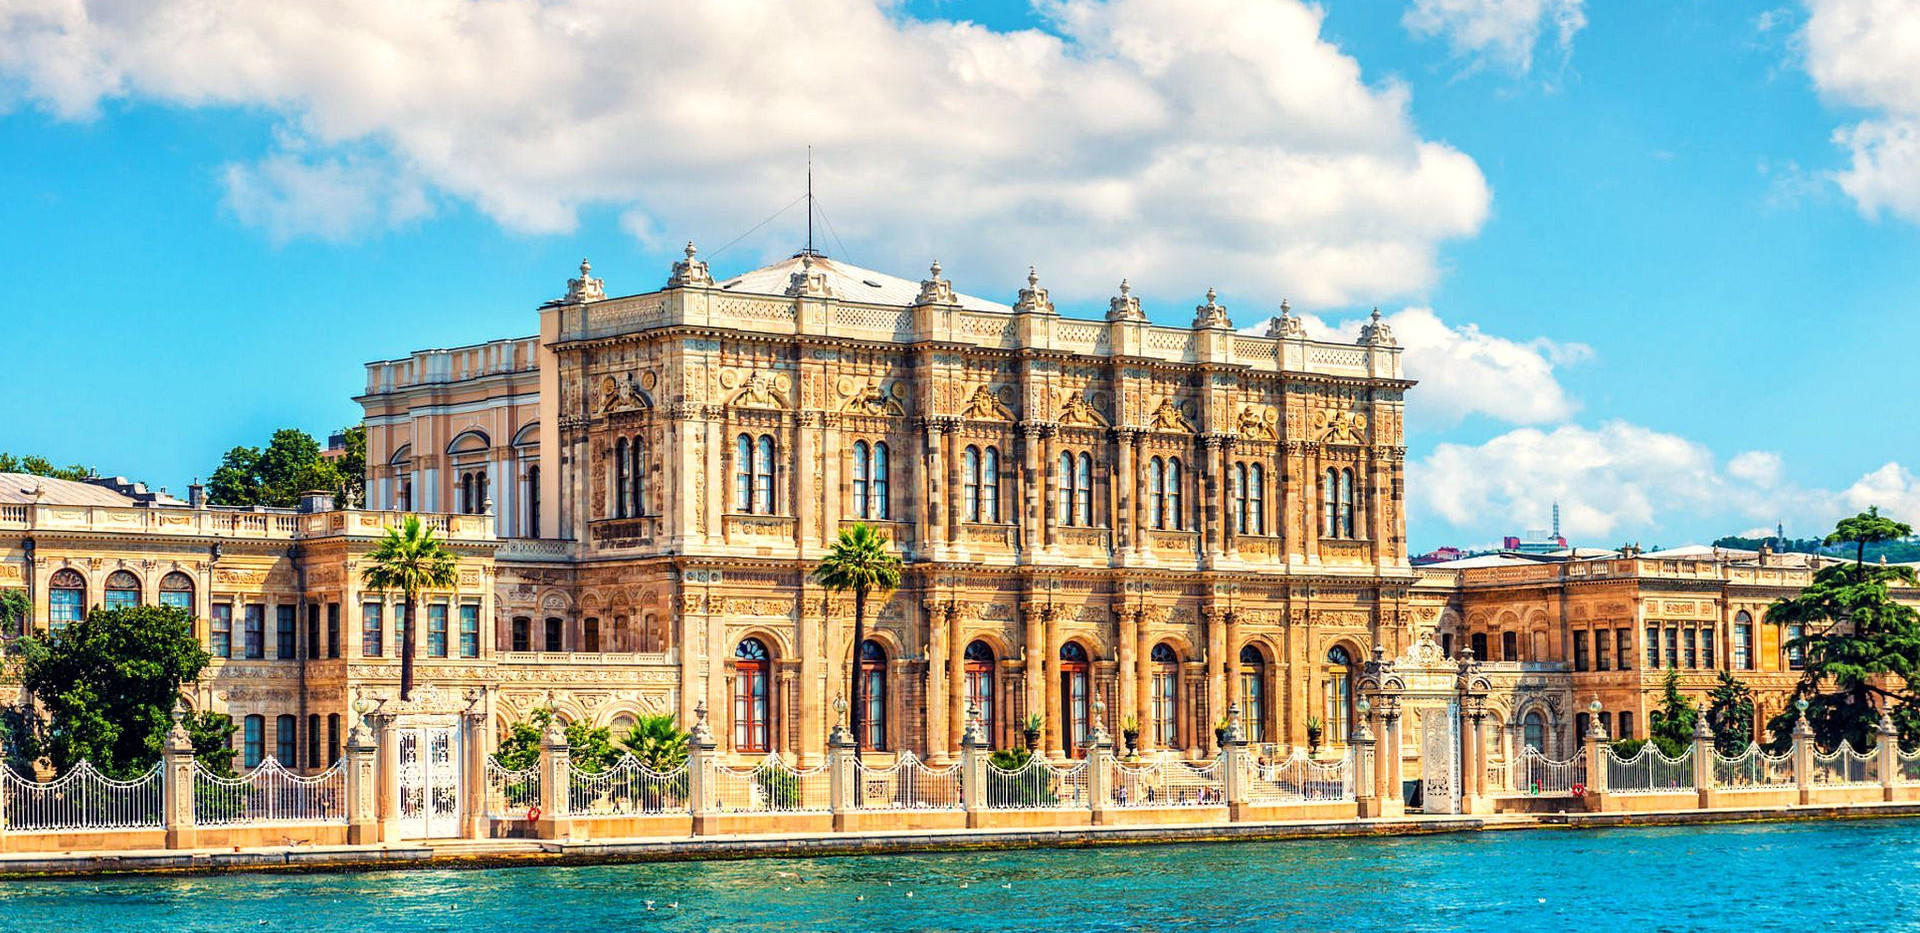 Estambul - Dolmabahce